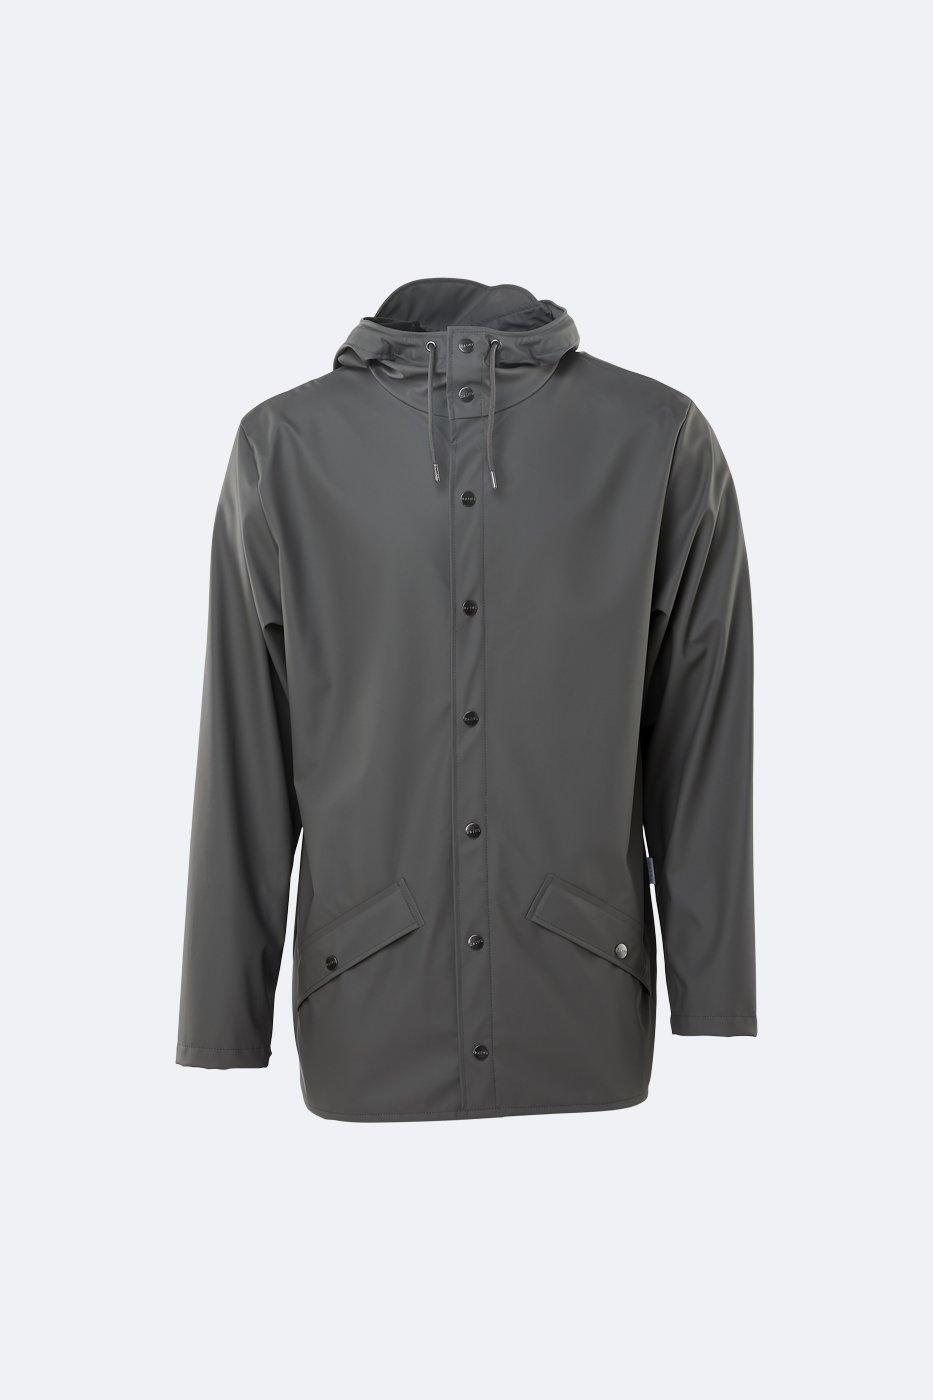 Rains Jacket charcoal unisex S/M